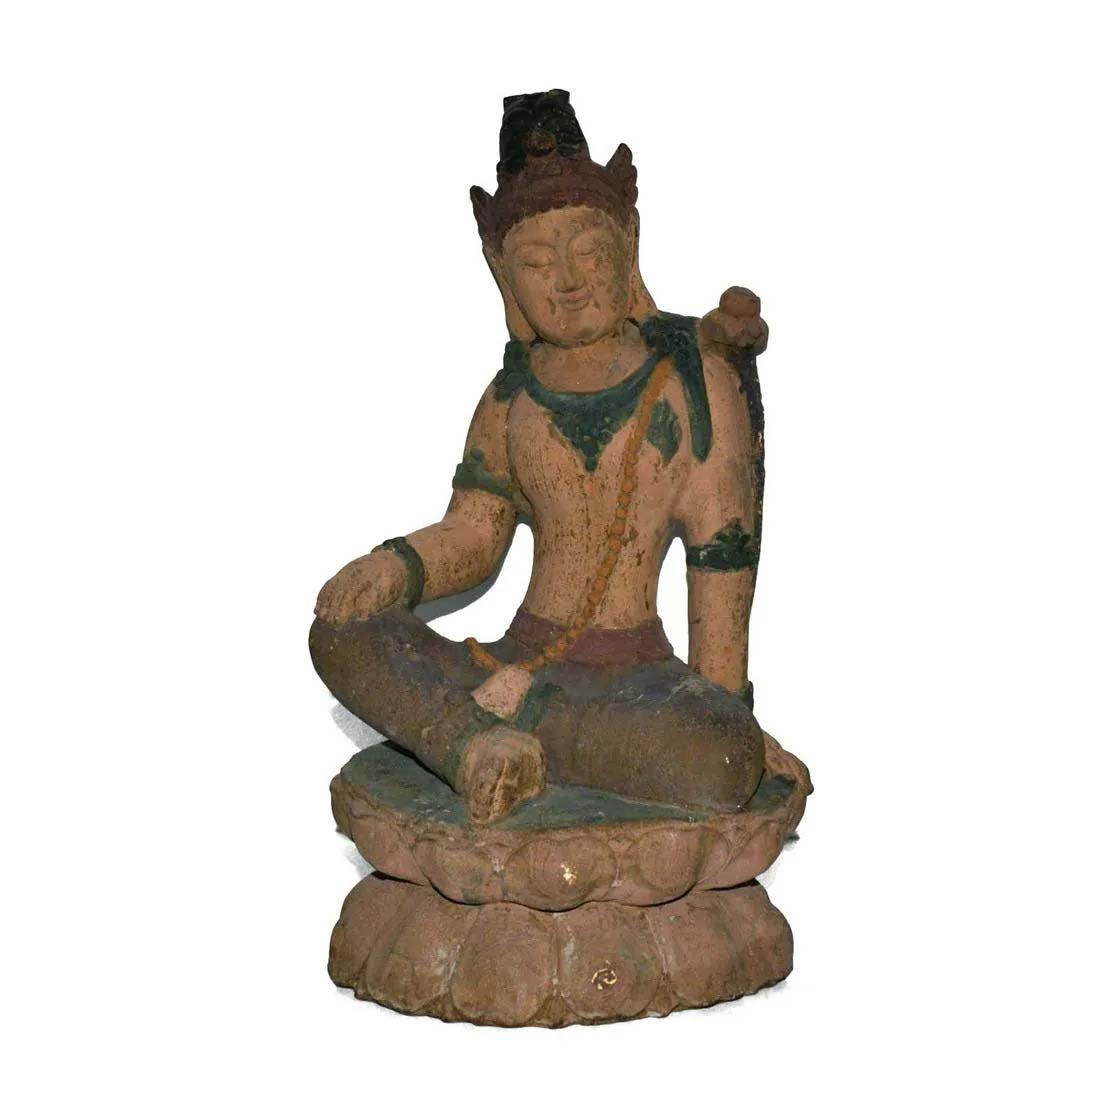 Polychrome painted wood figure of Bodhisattva $3,000-$4,000. Image courtesy Gianguan Auctions